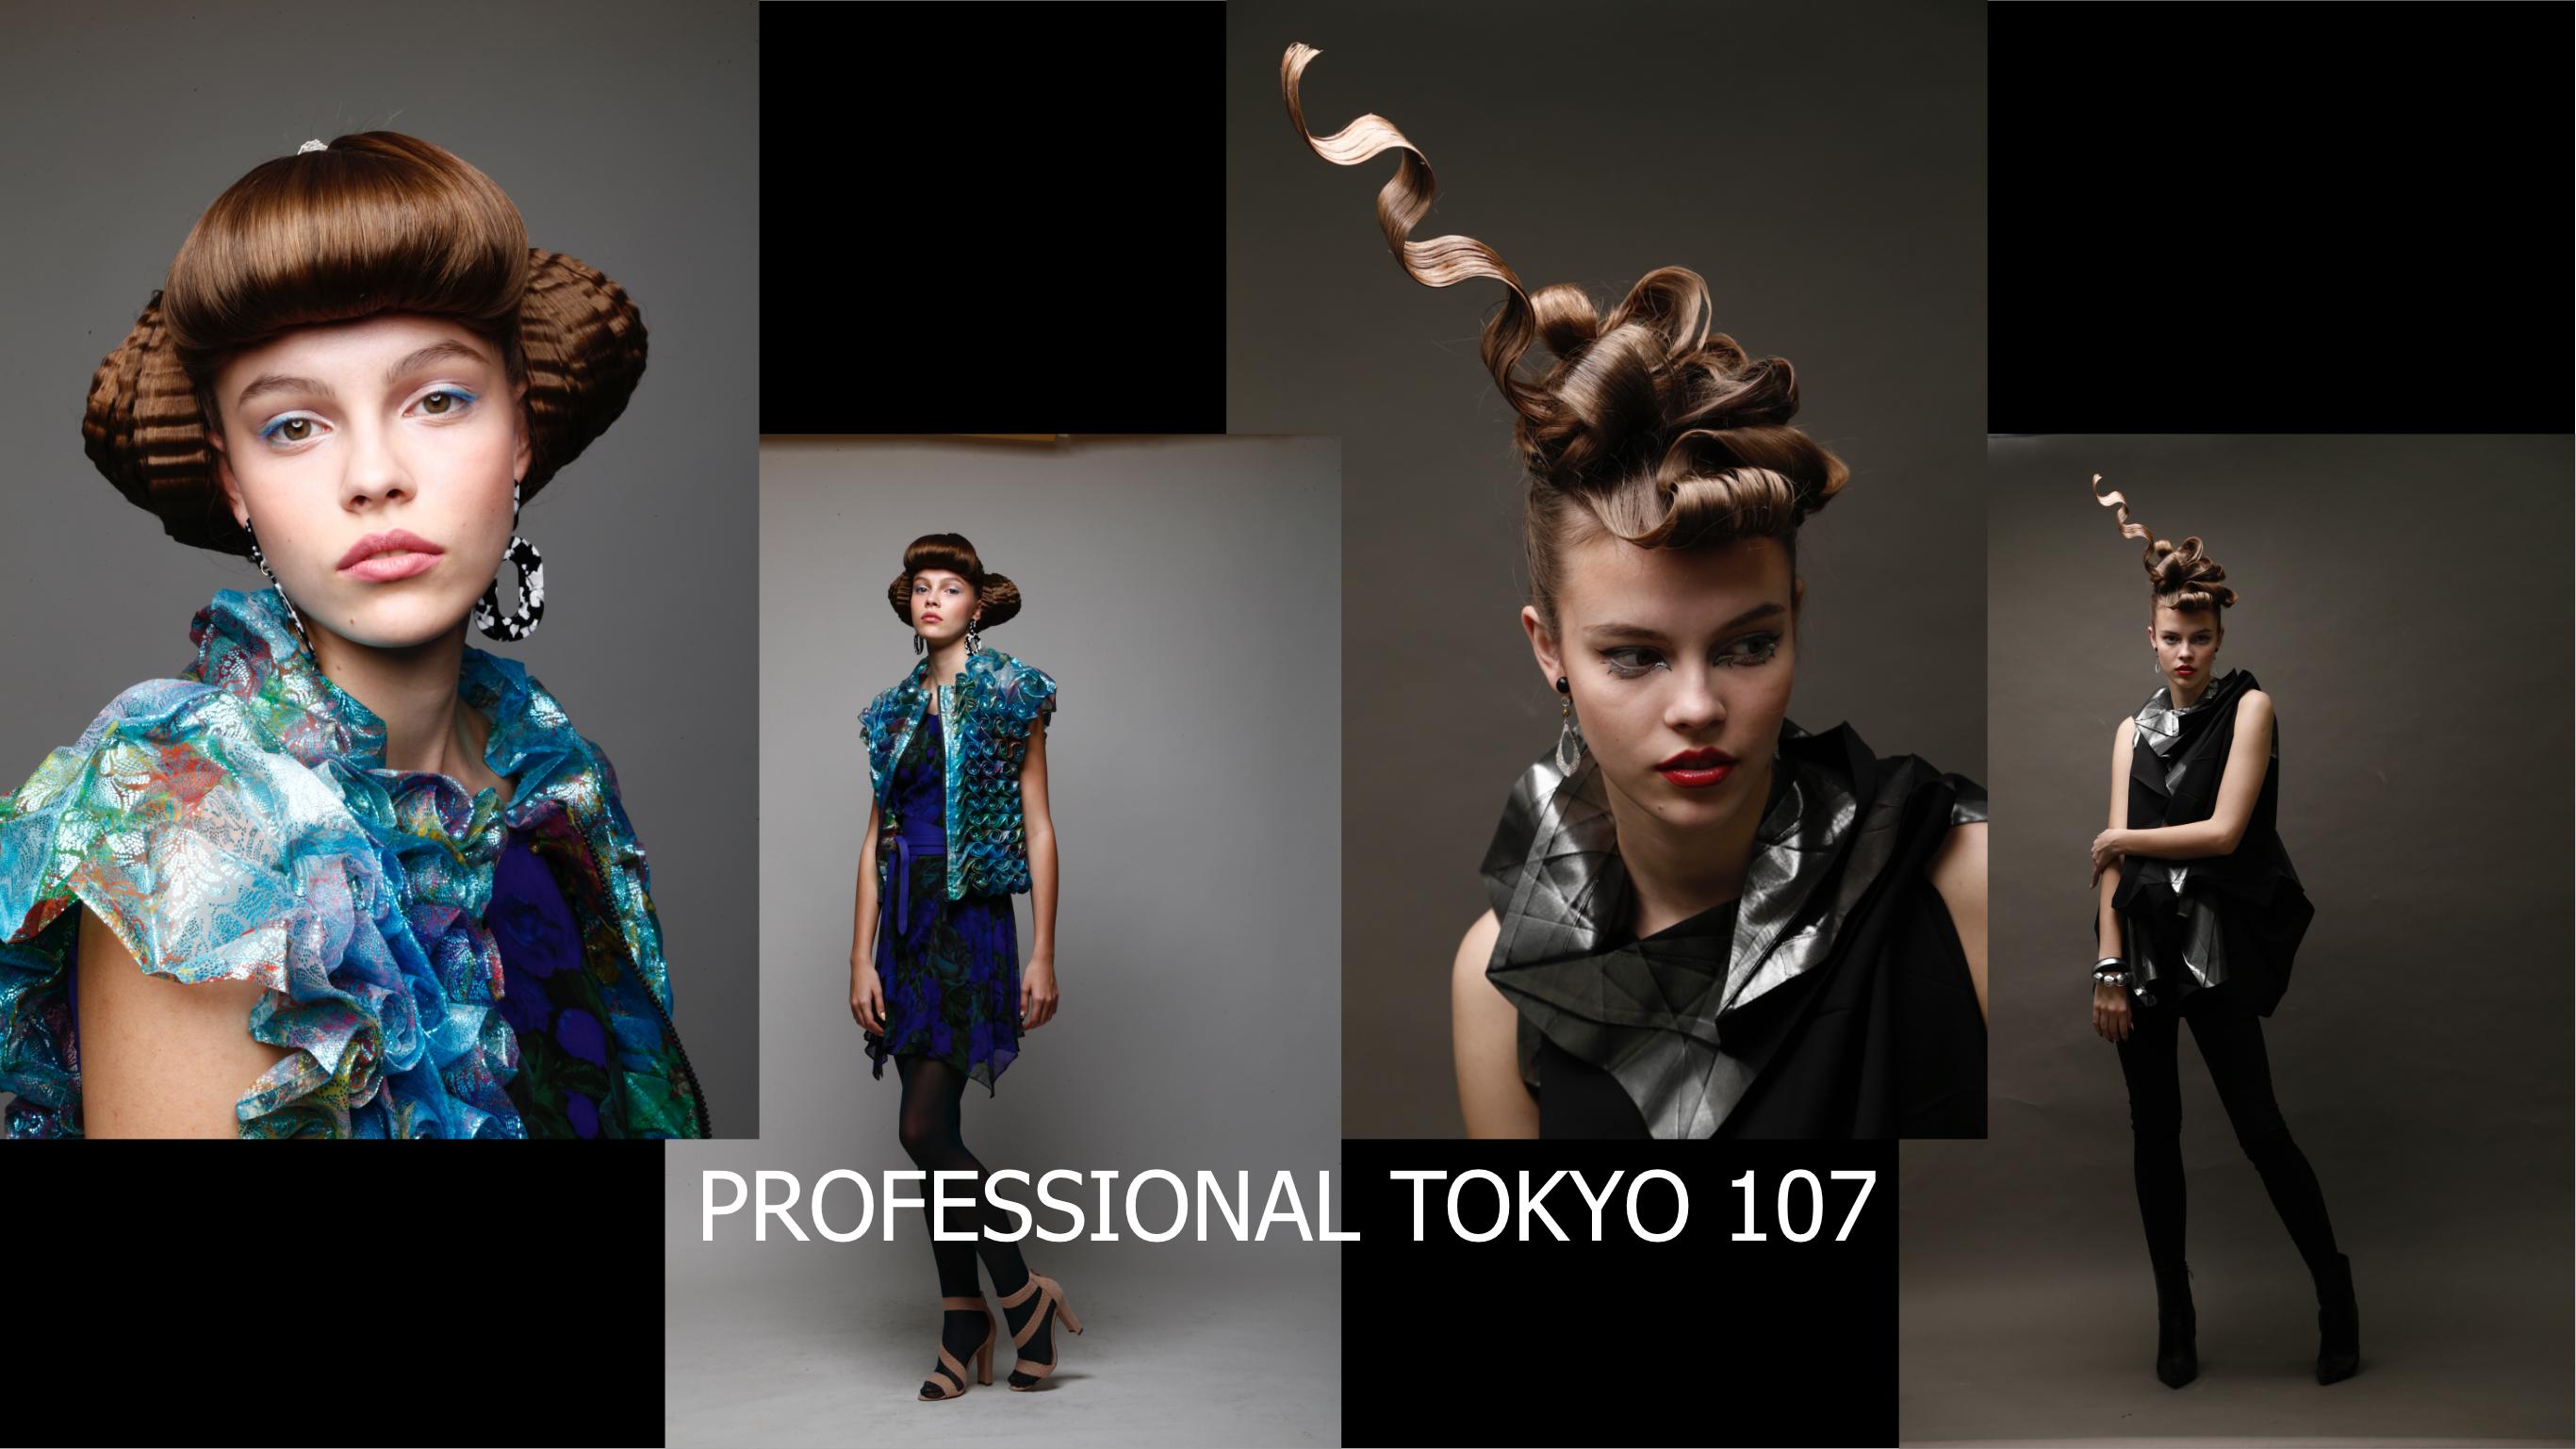 PROFESSIONAL TOKYO 107